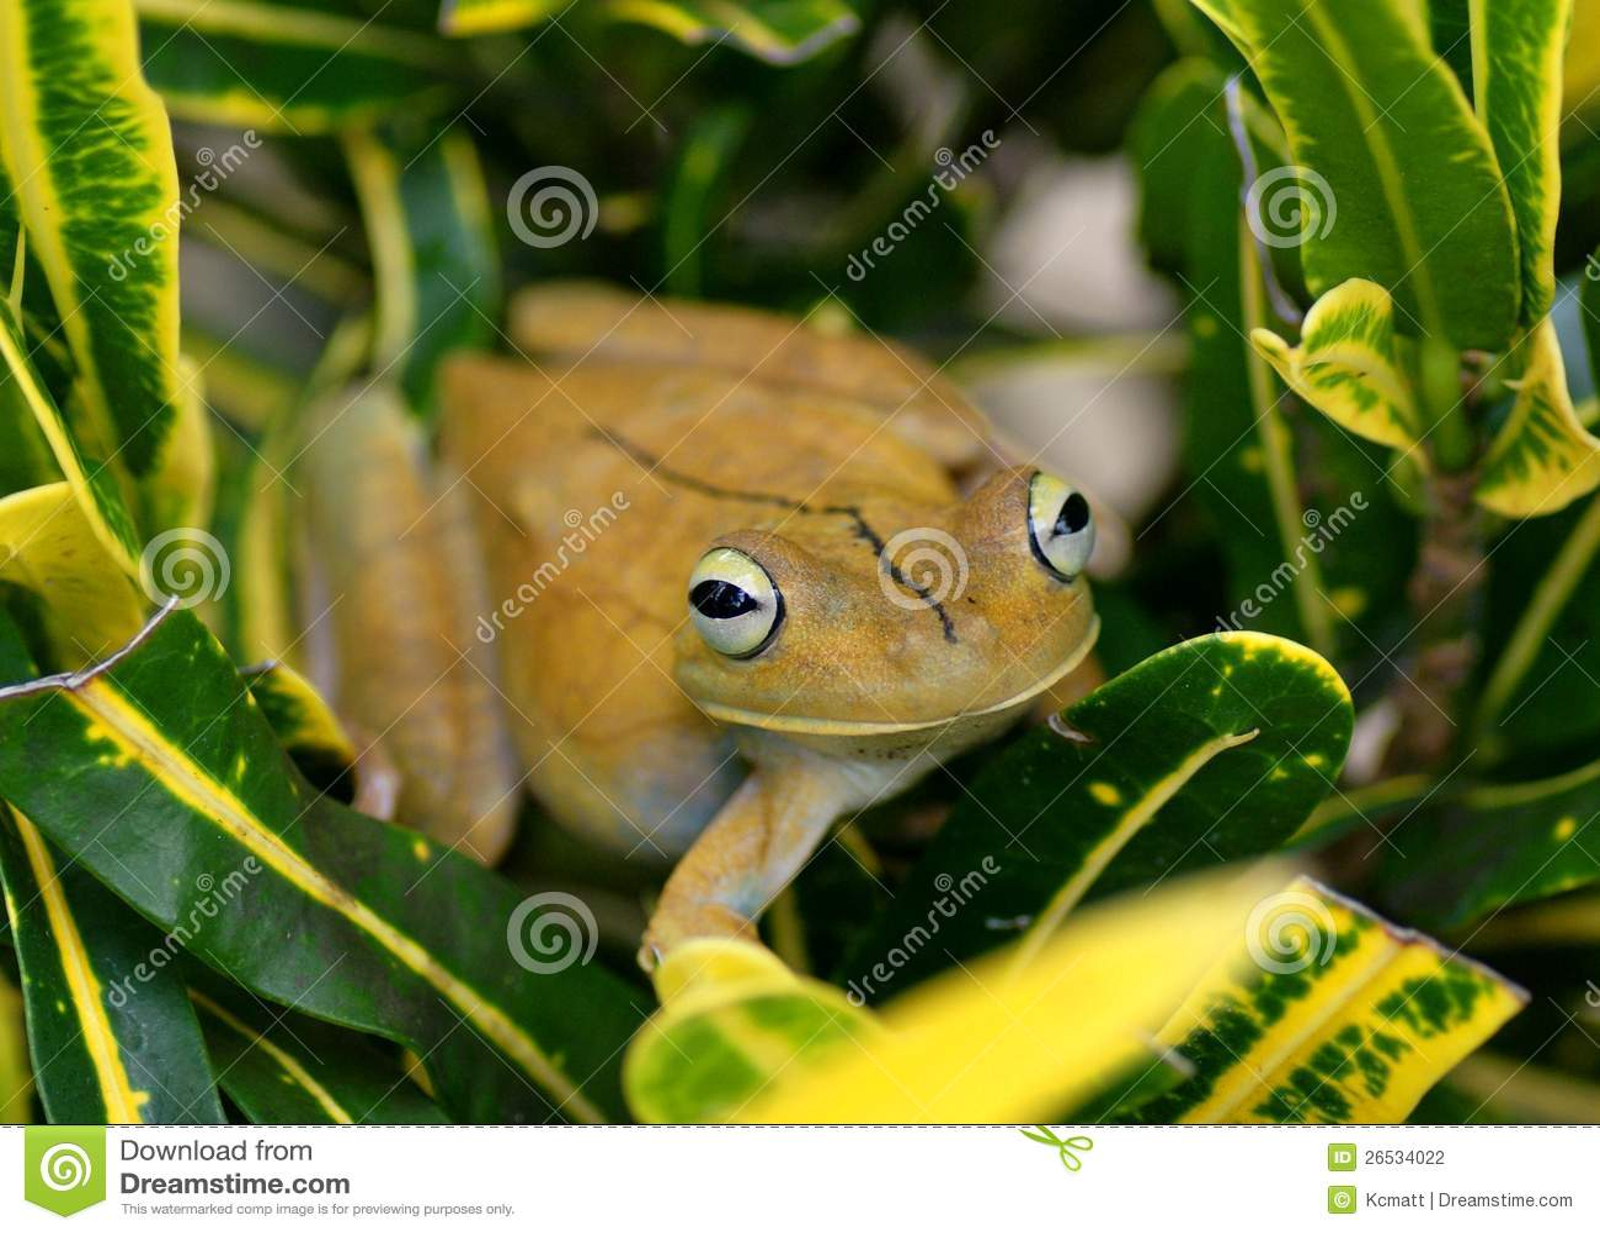 Uncommon Animals Tropical Rainforest